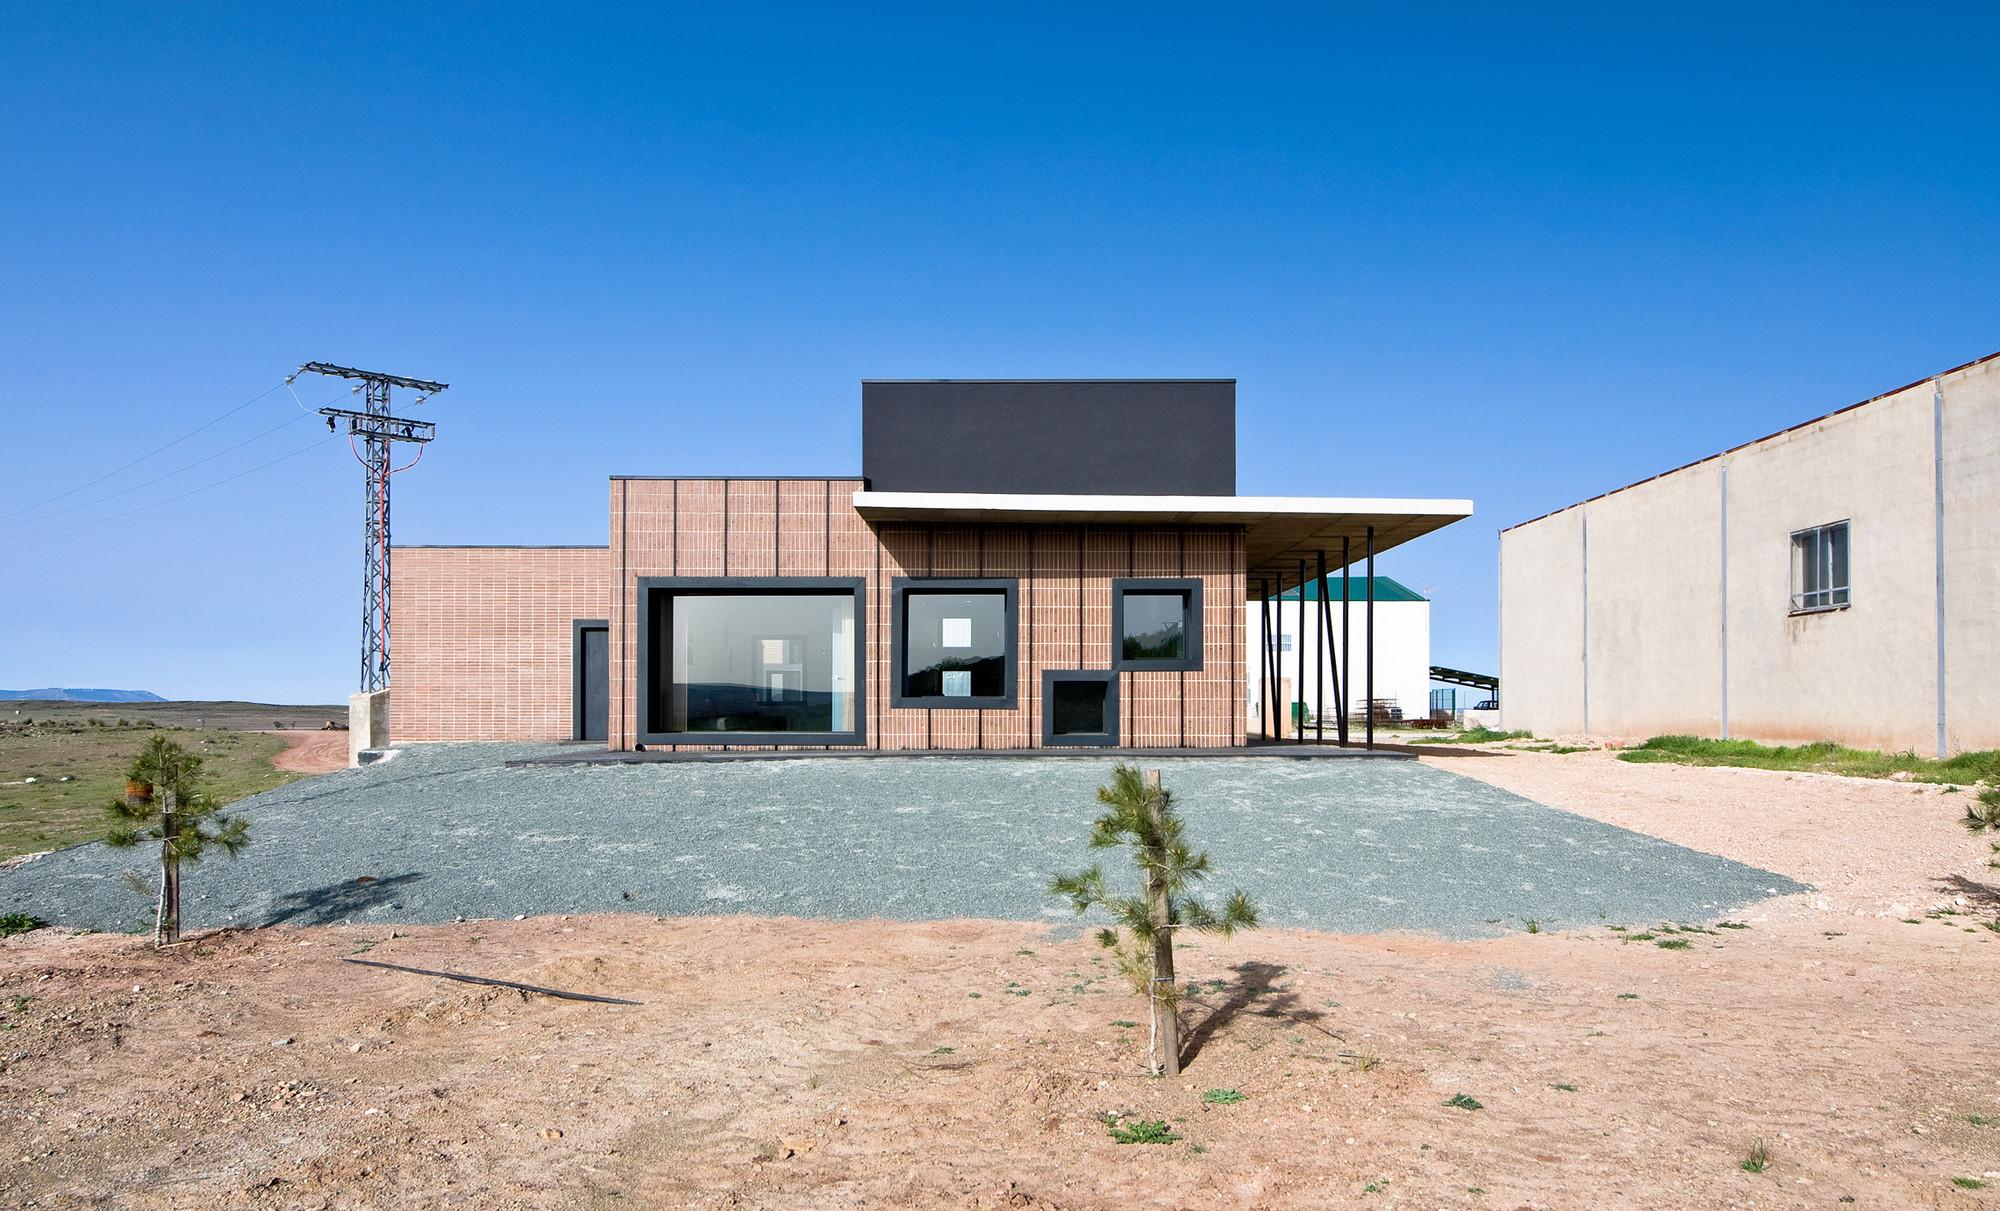 Municipal Funeral Home Montealegre del Castillo, Albacete / dra arquitectos